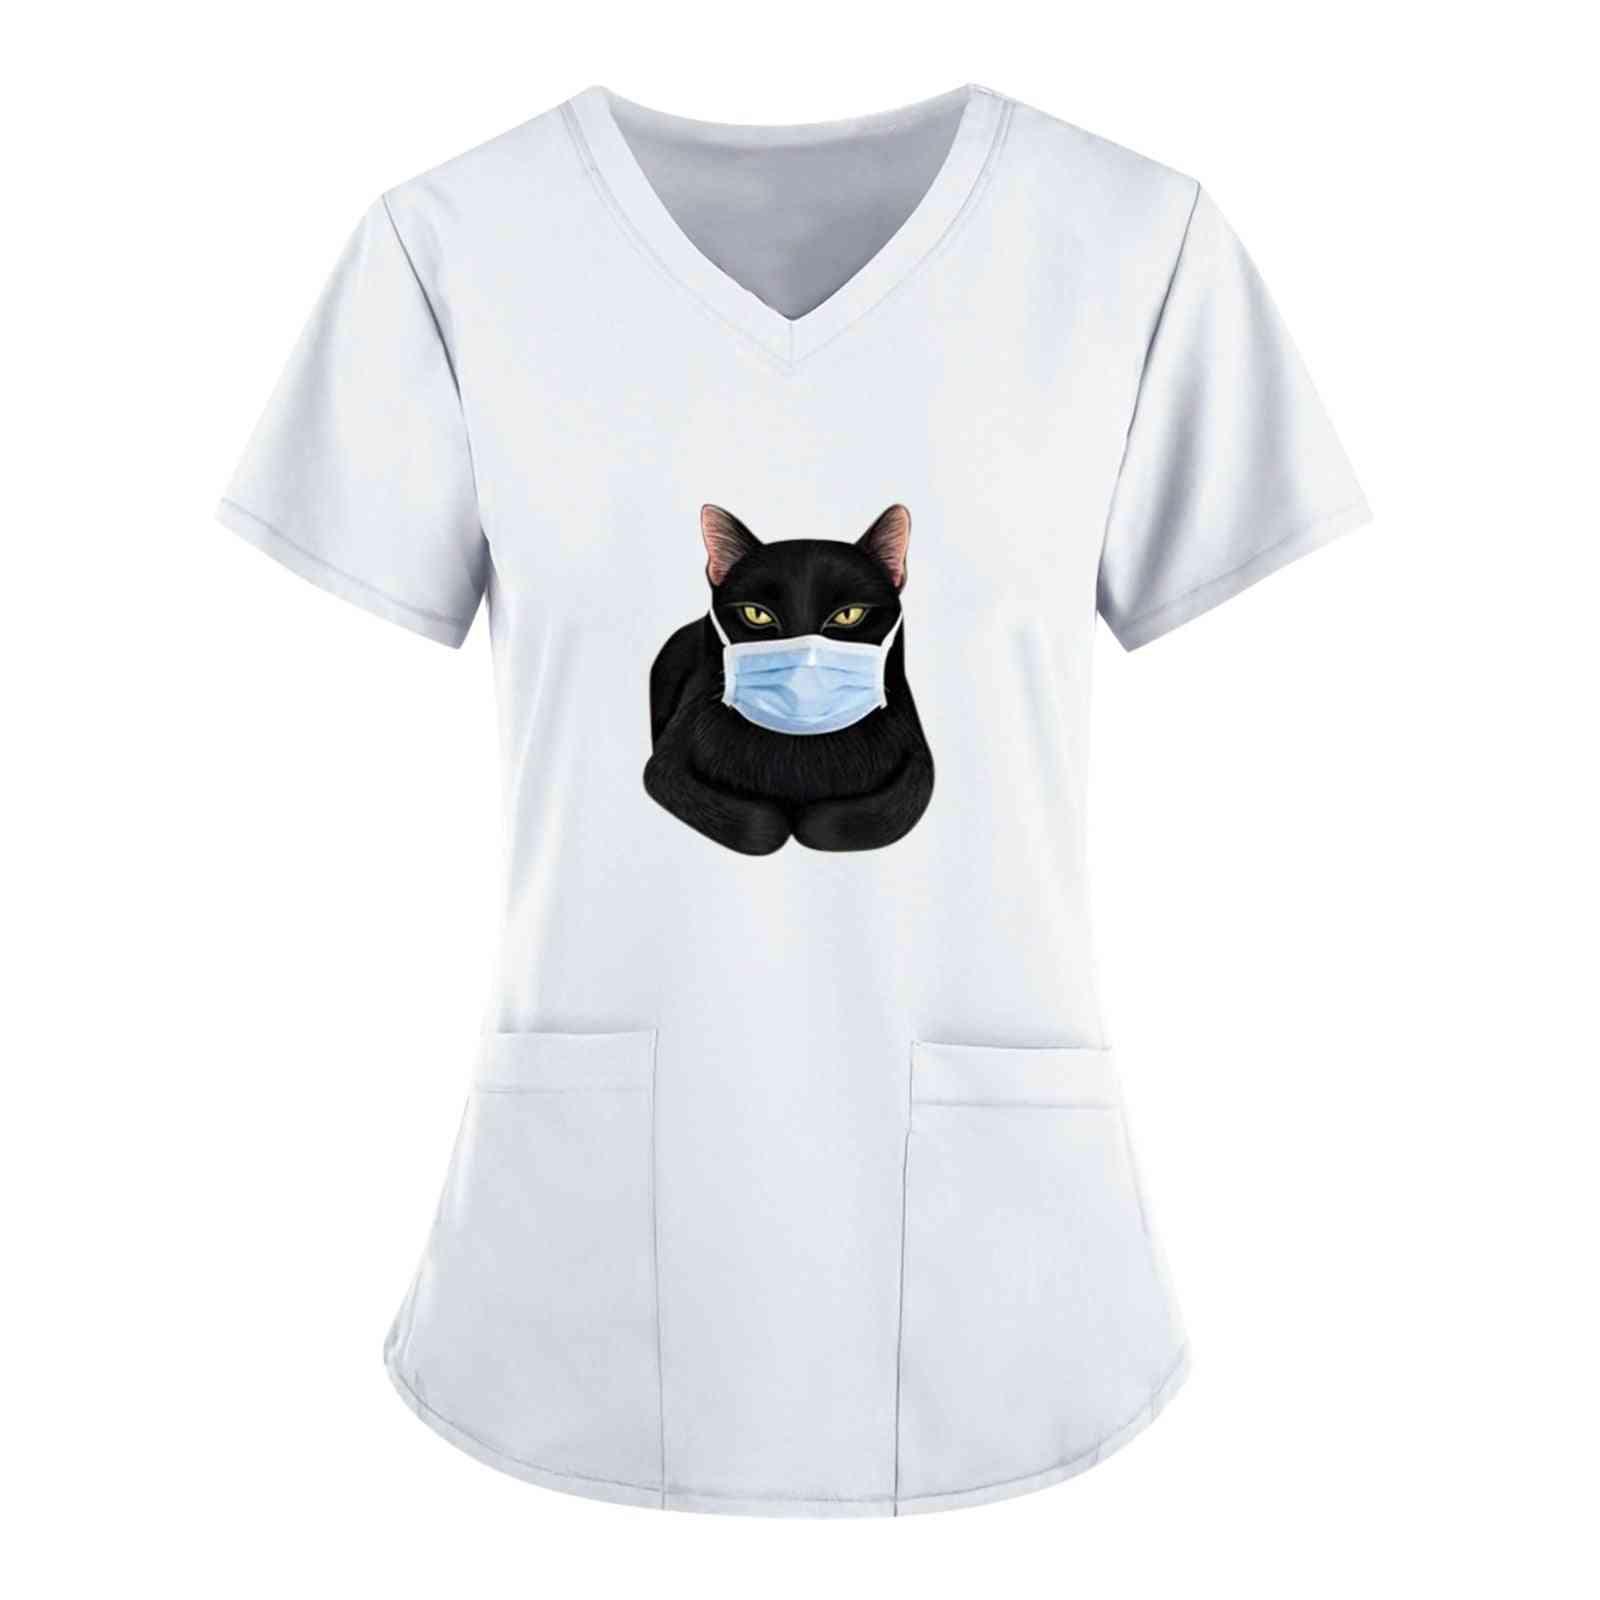 Black Cat Print Nursing Scrubs Tops